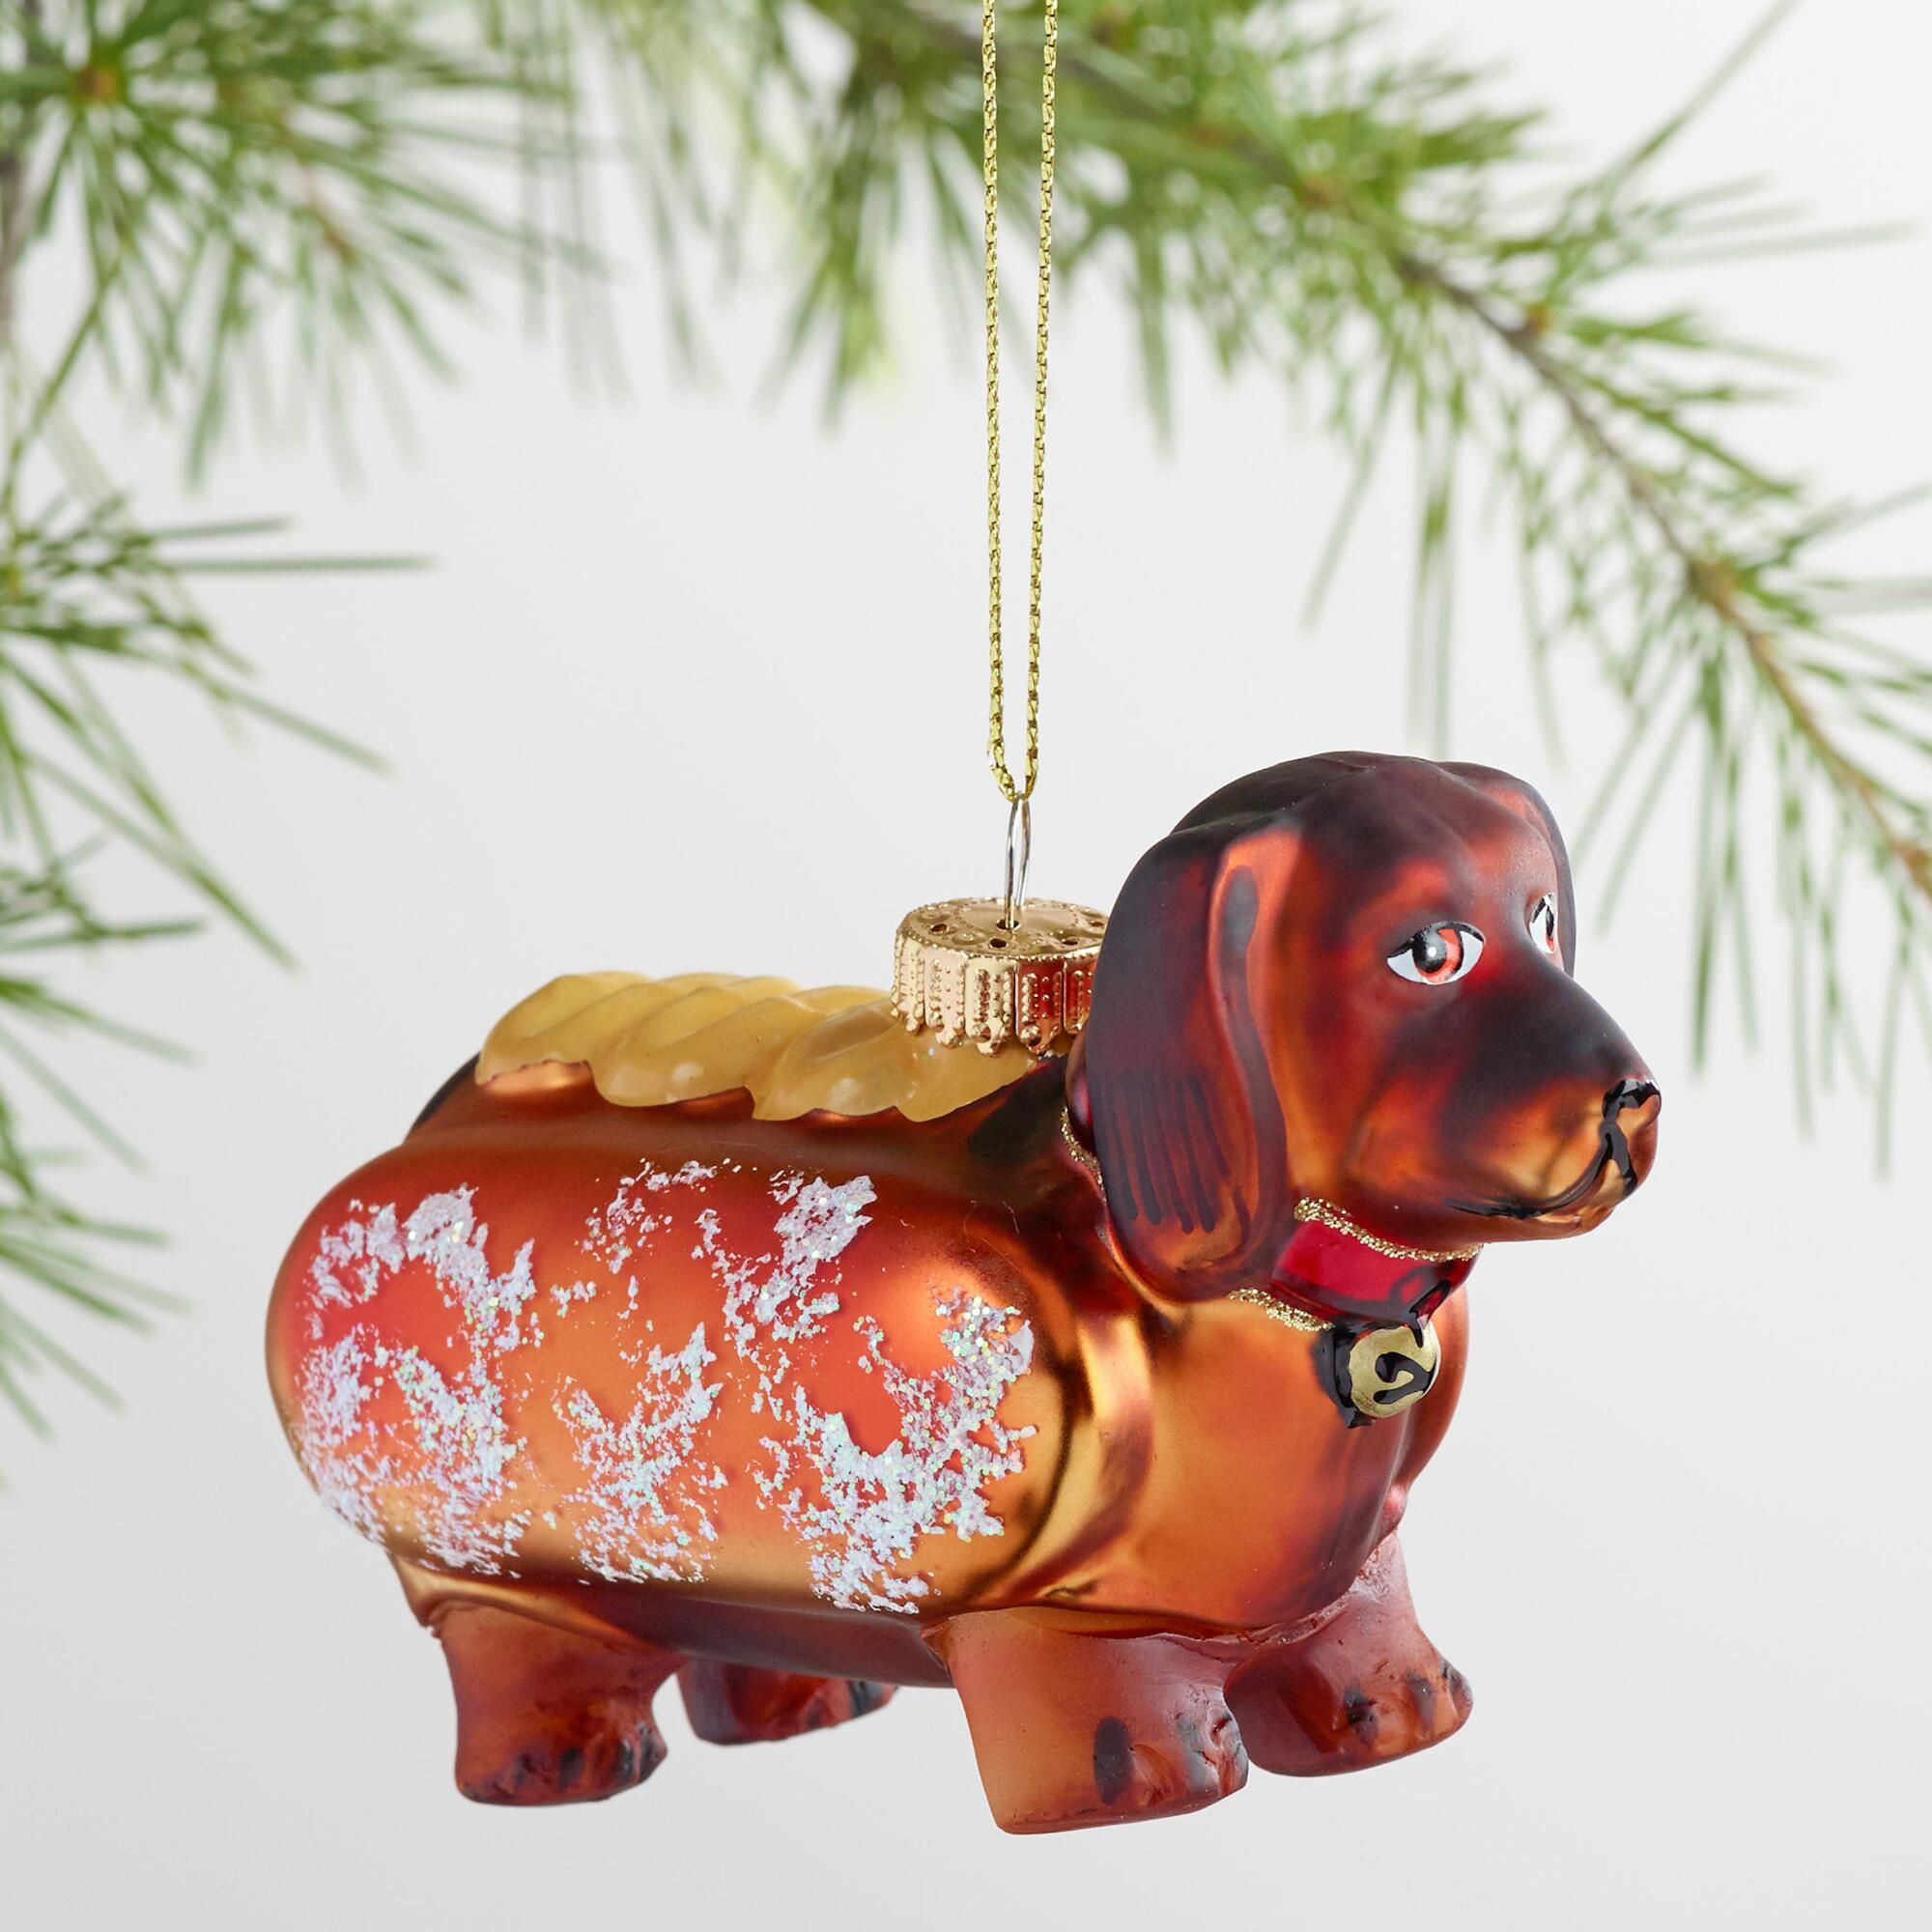 Glass Hot Dog Dachshund Ornament Dachshund Ornament Dachshund